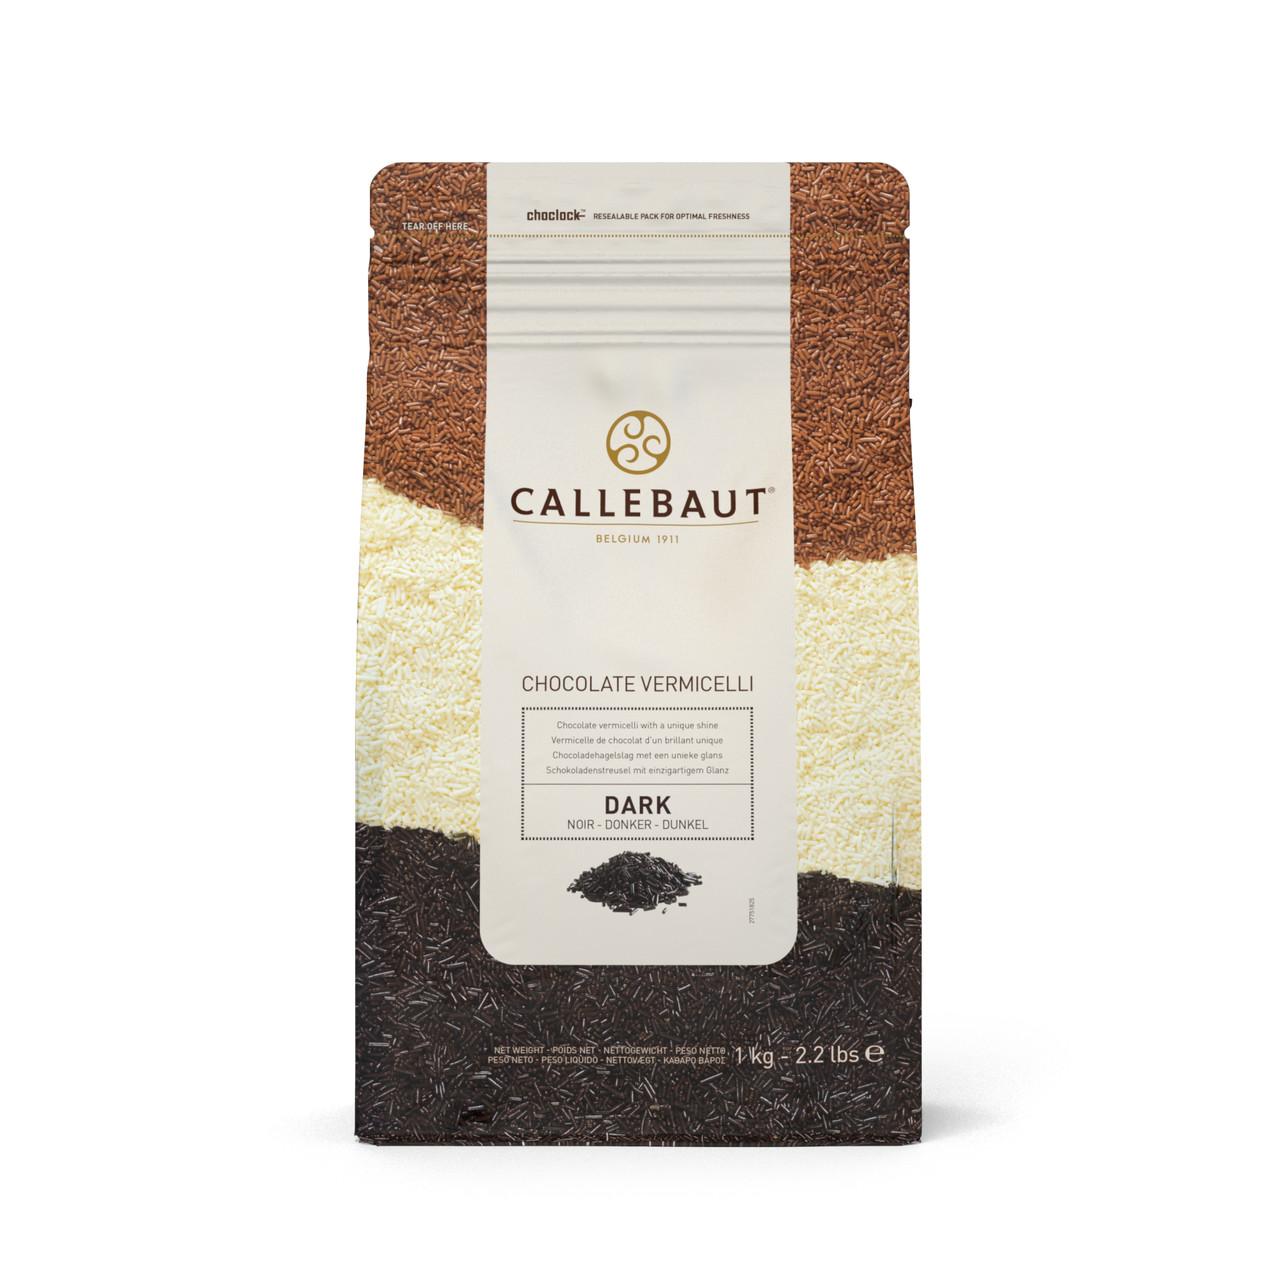 Callebaut Vermicelli Chocolate Amargo 1kg